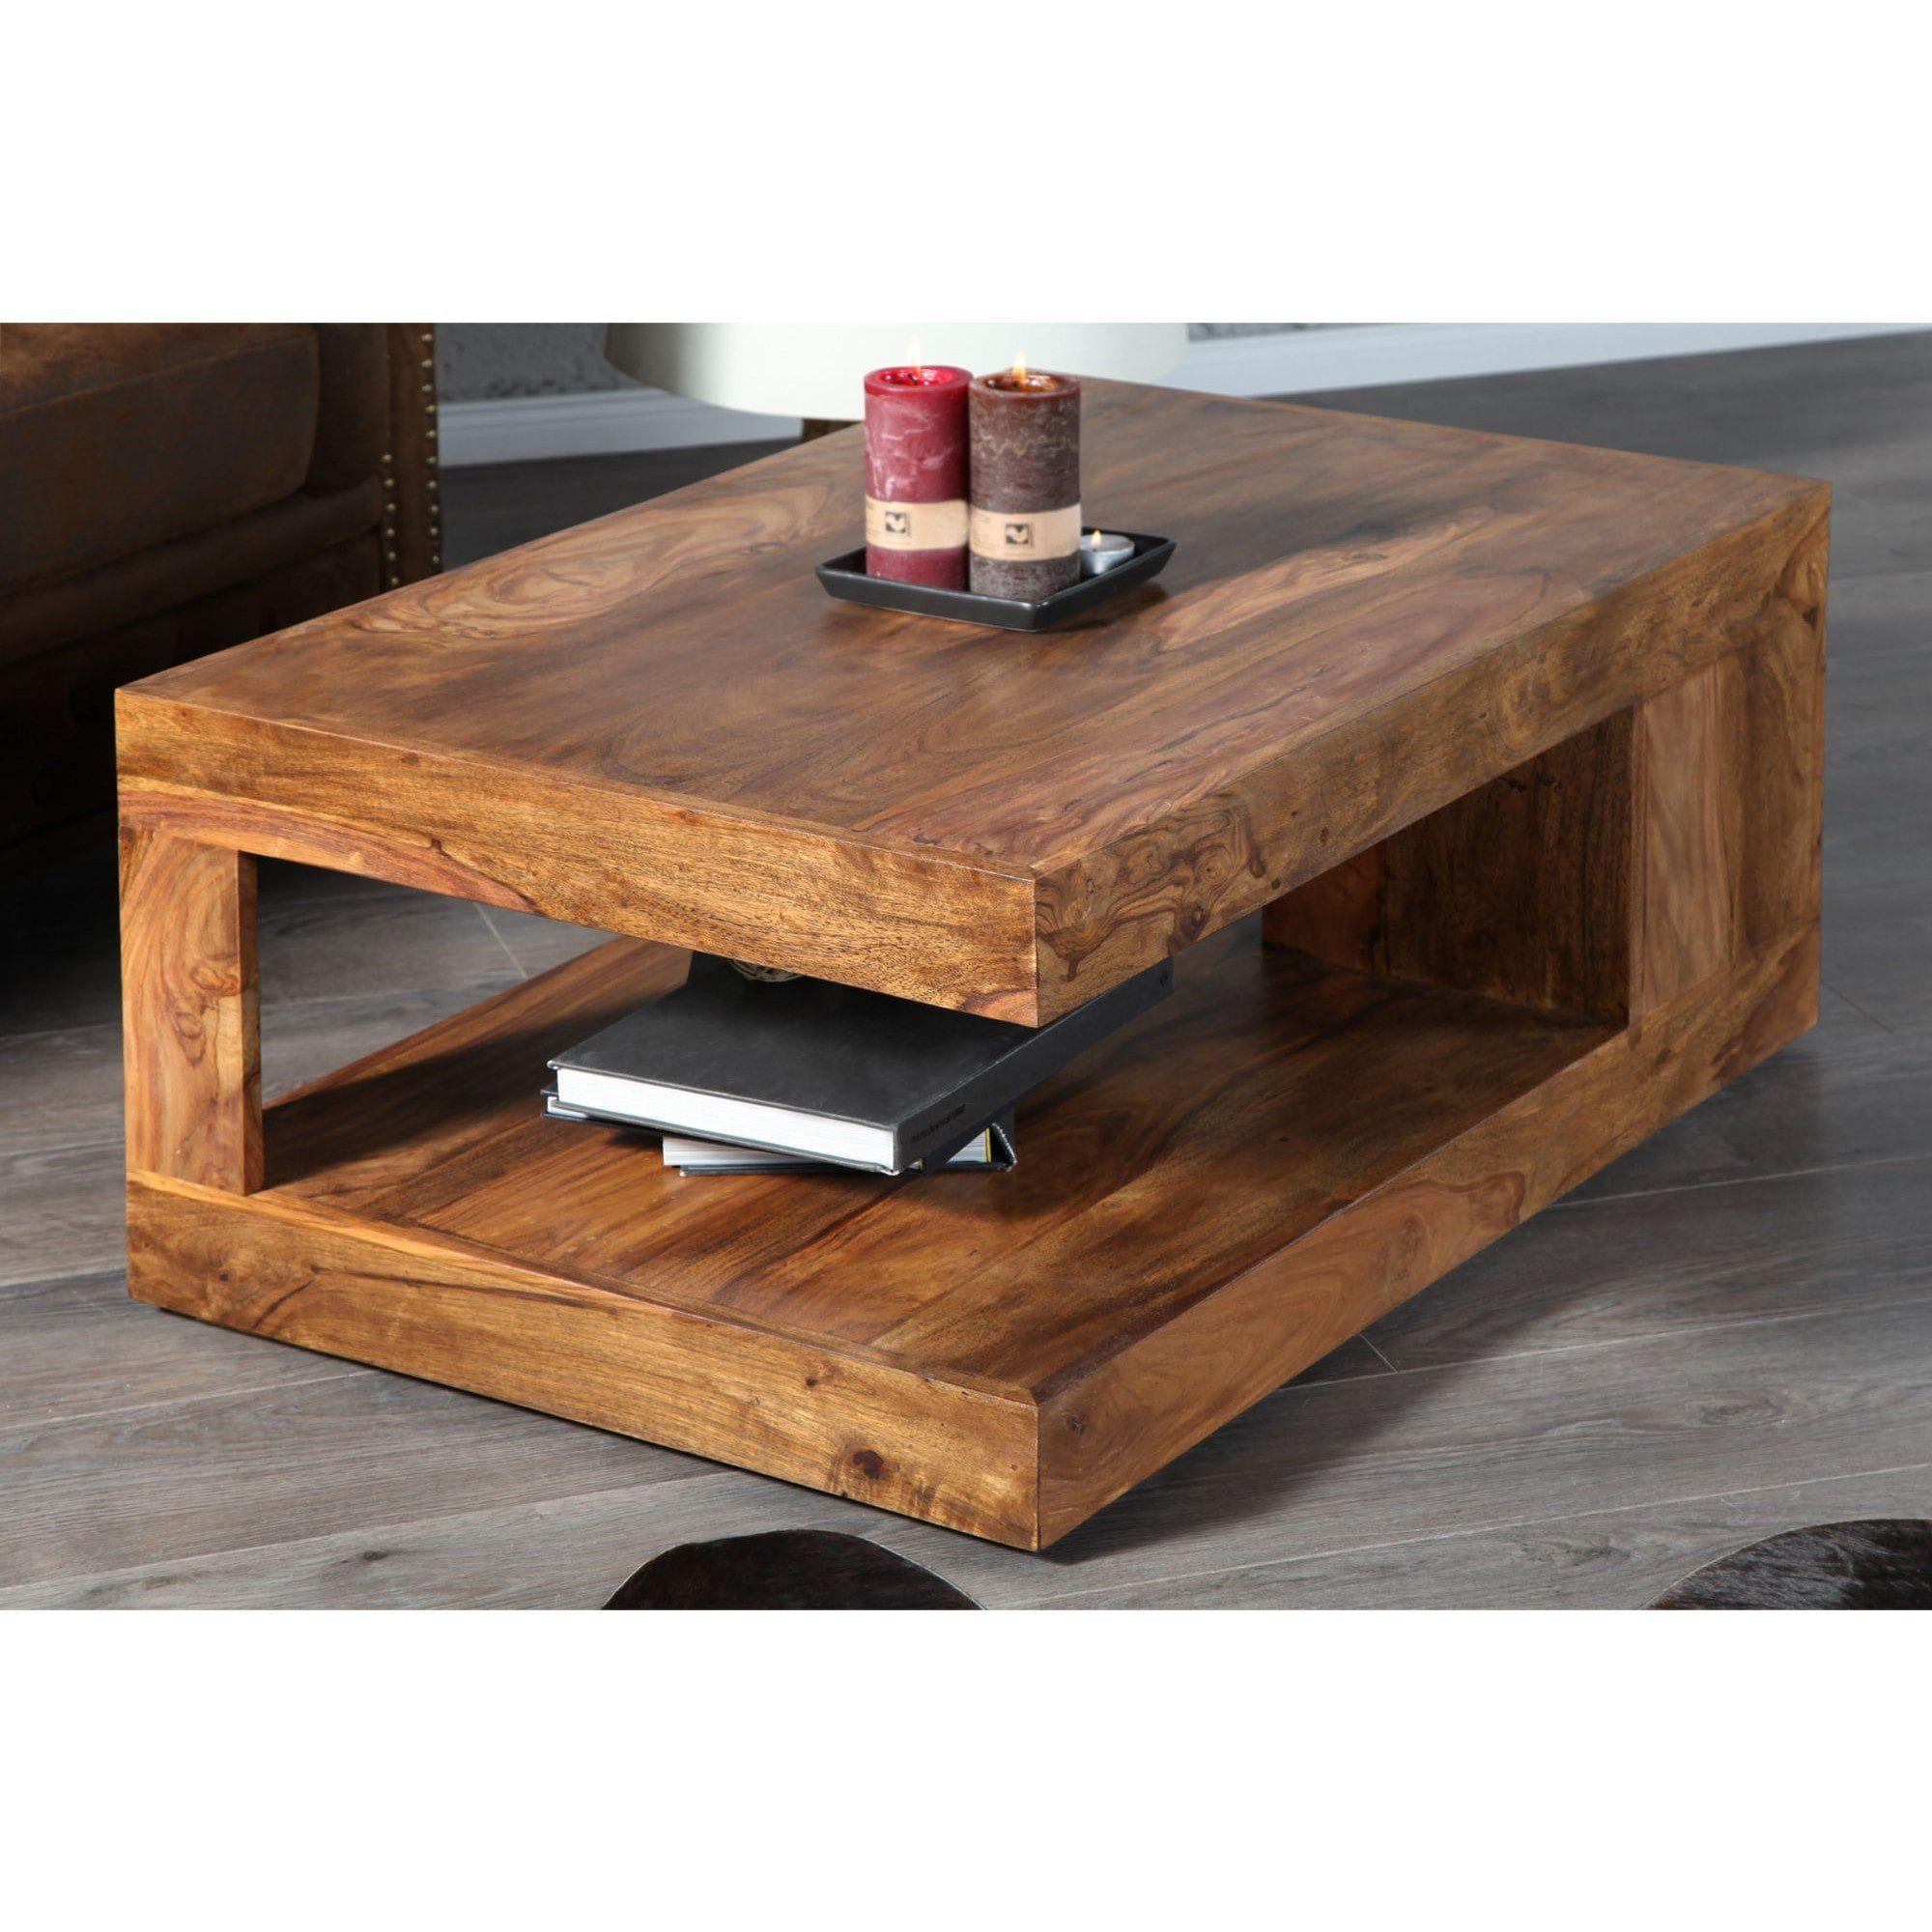 Table Basse Rectangle Bois Massif Comforium Com Table De Salon Table Basse Design Bois Table Basse